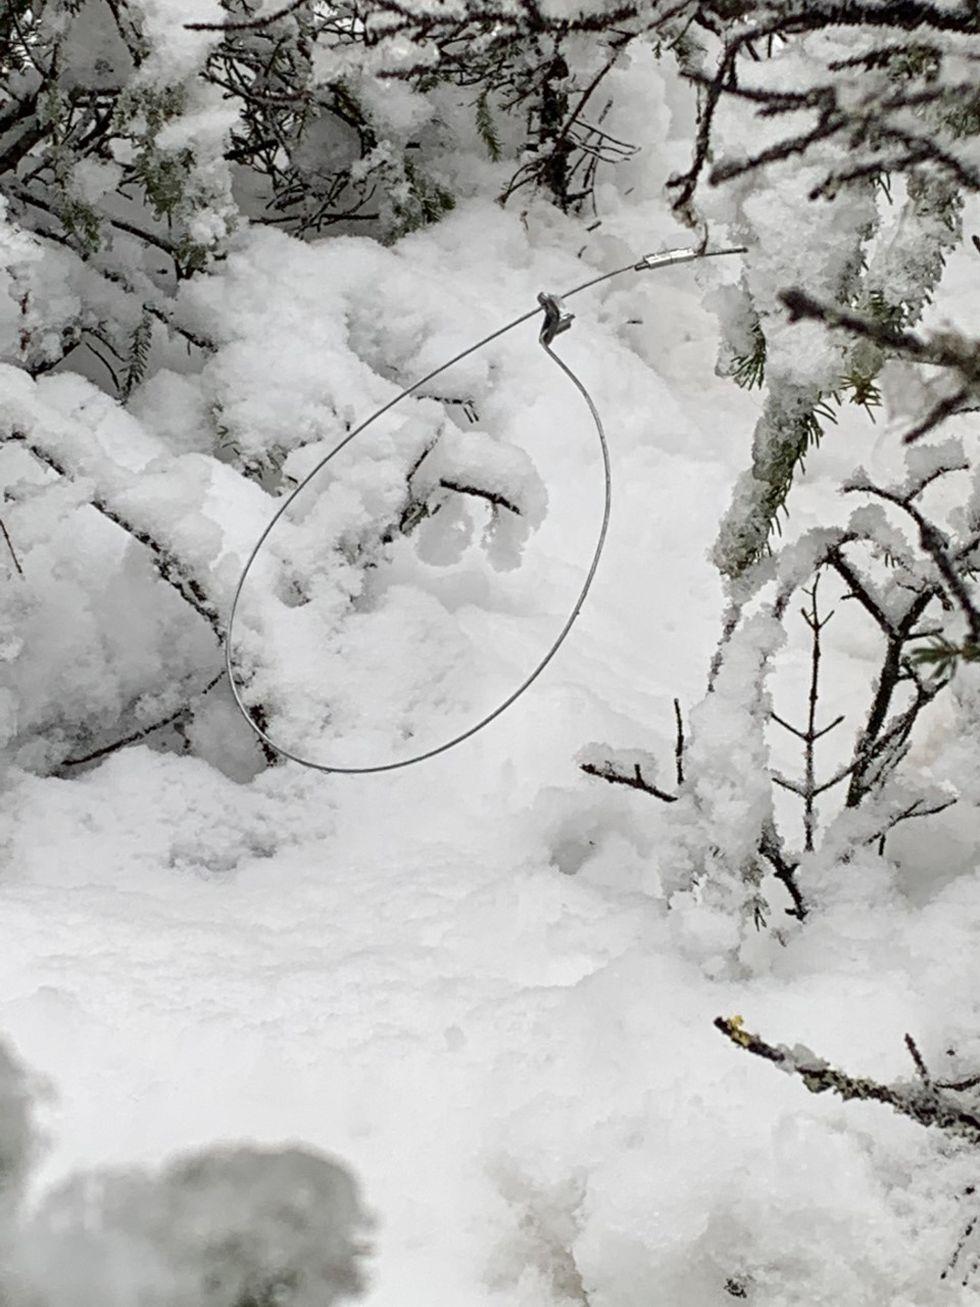 Illegal snare trap found near Hillside trail